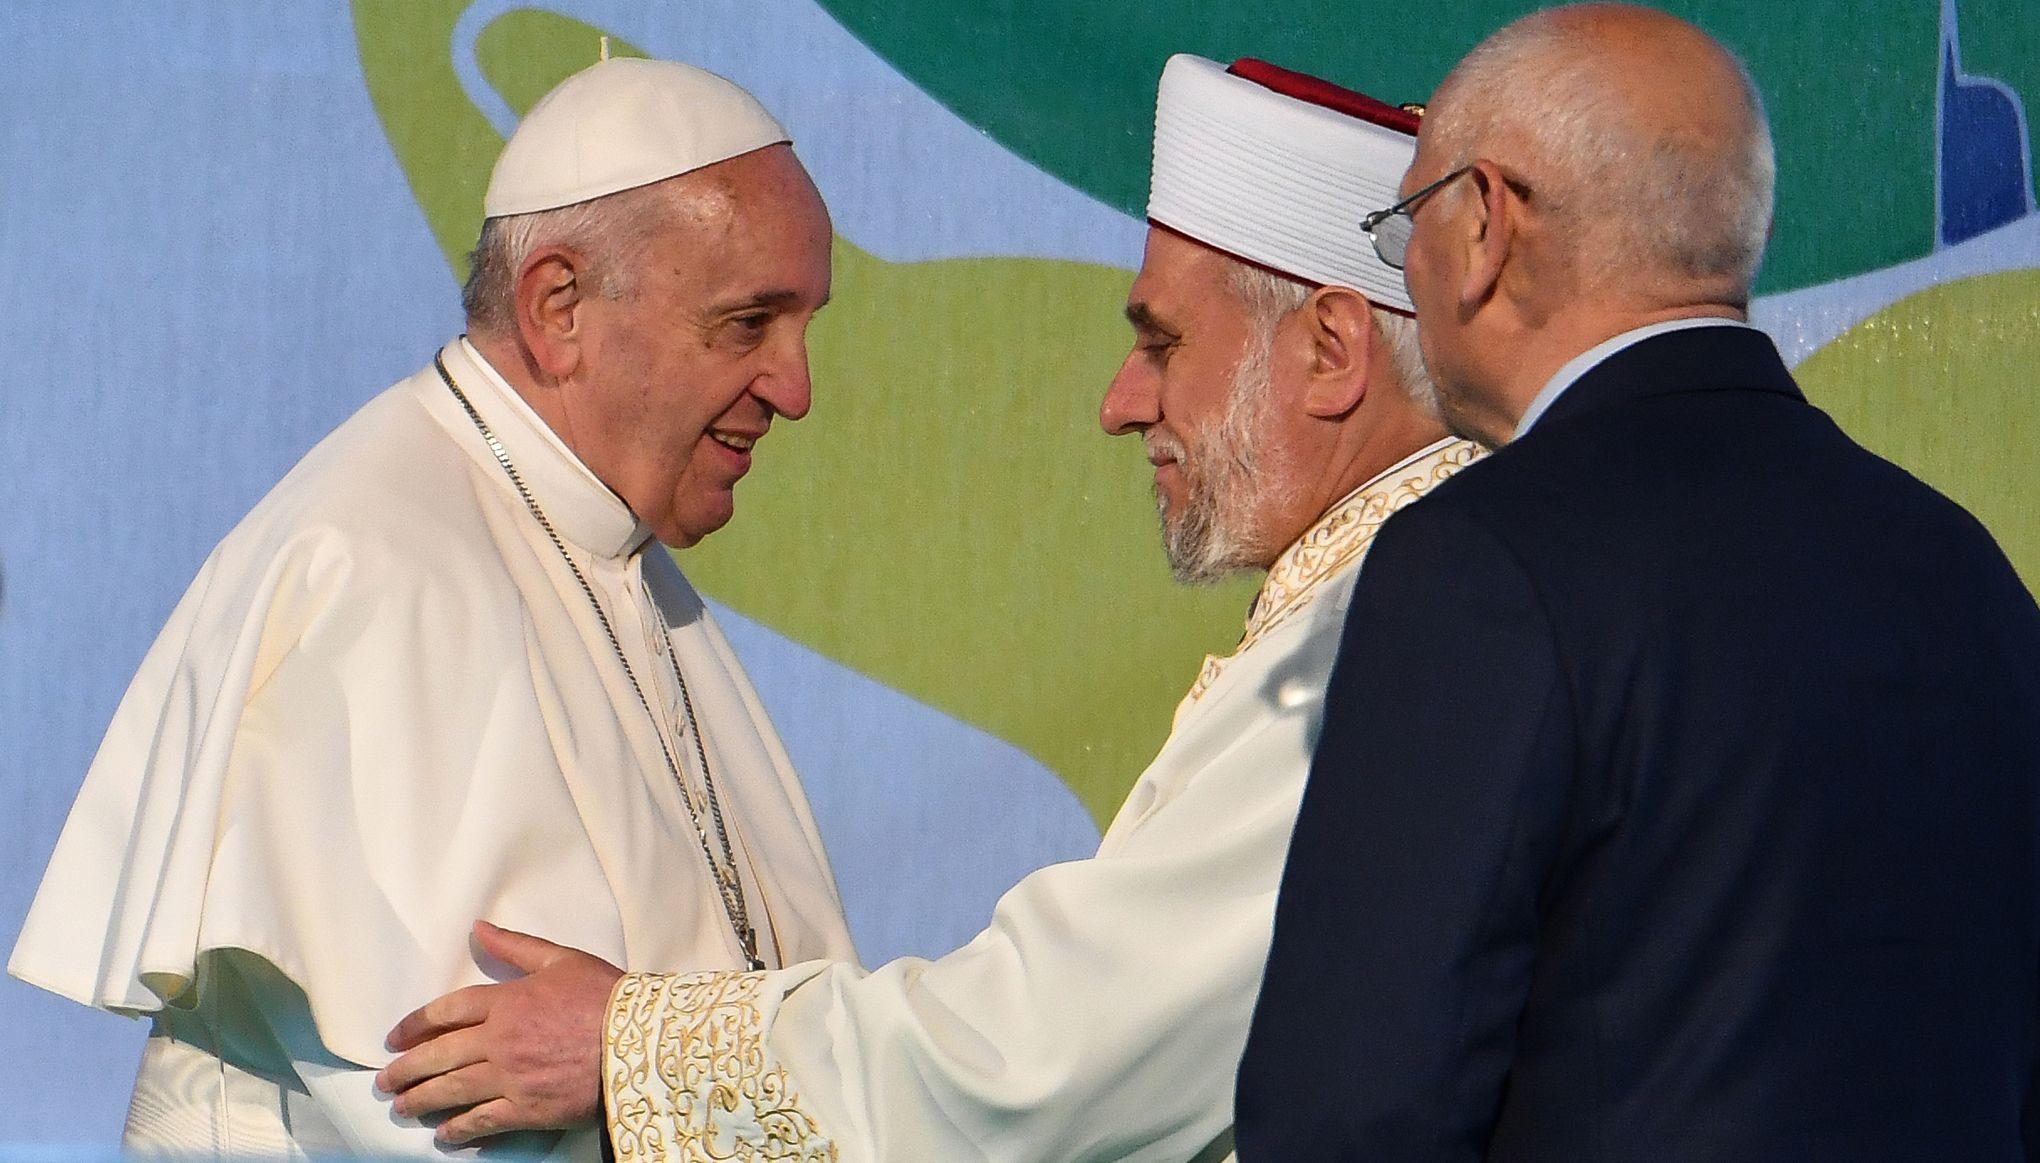 juif rencontres conseils orthodoxes